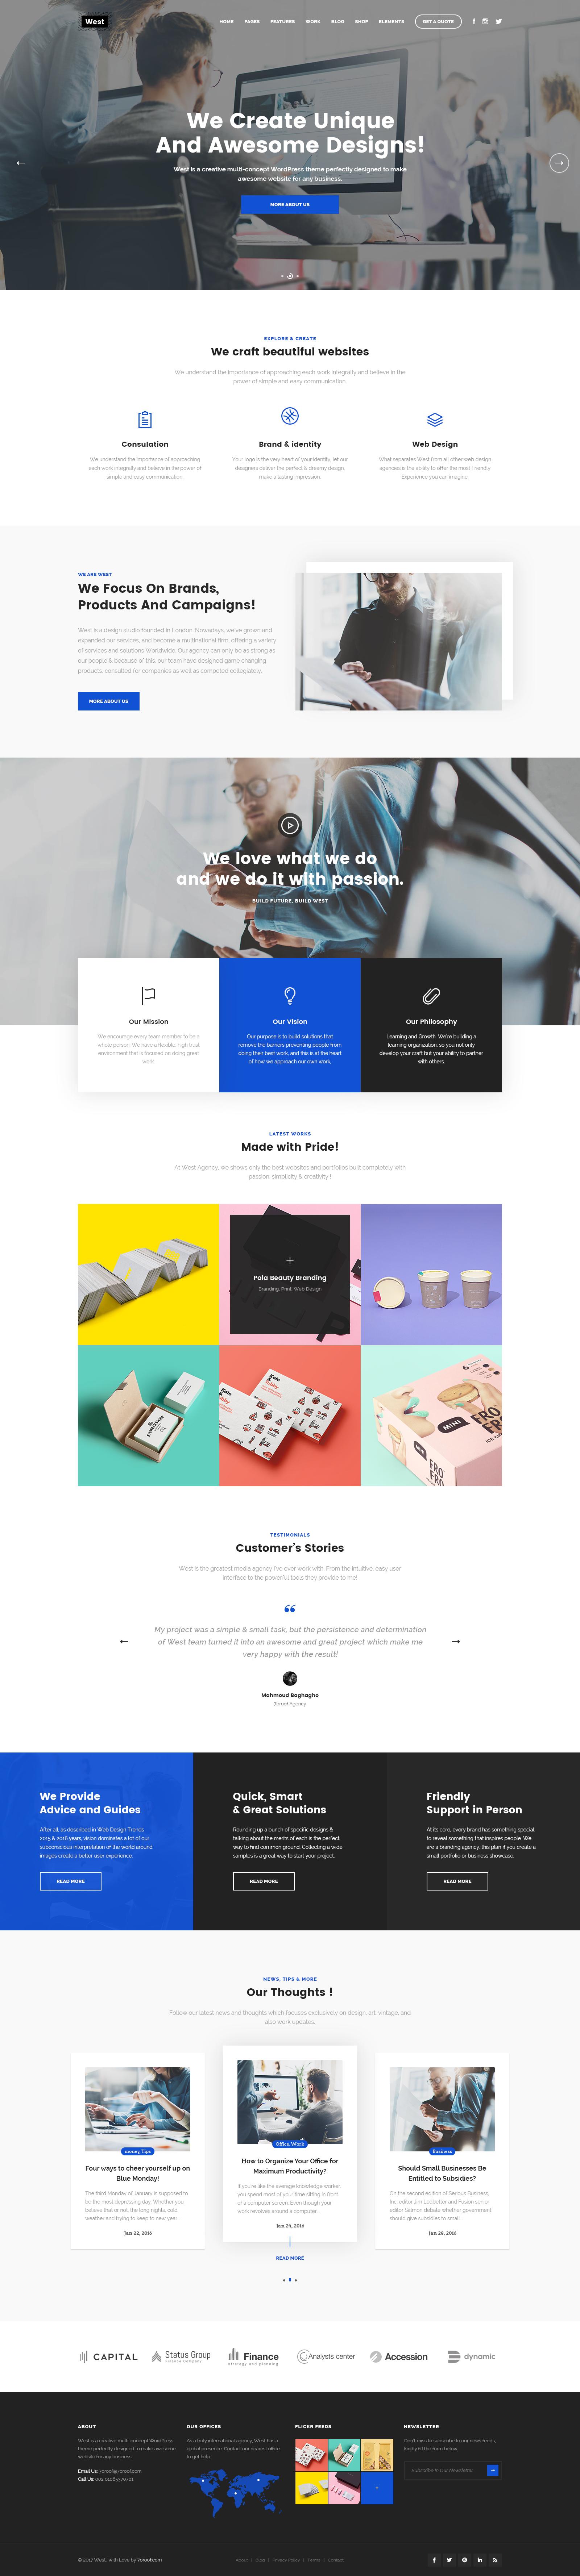 166 Home Web Studio Web Layout Web Design Web Design Inspiration